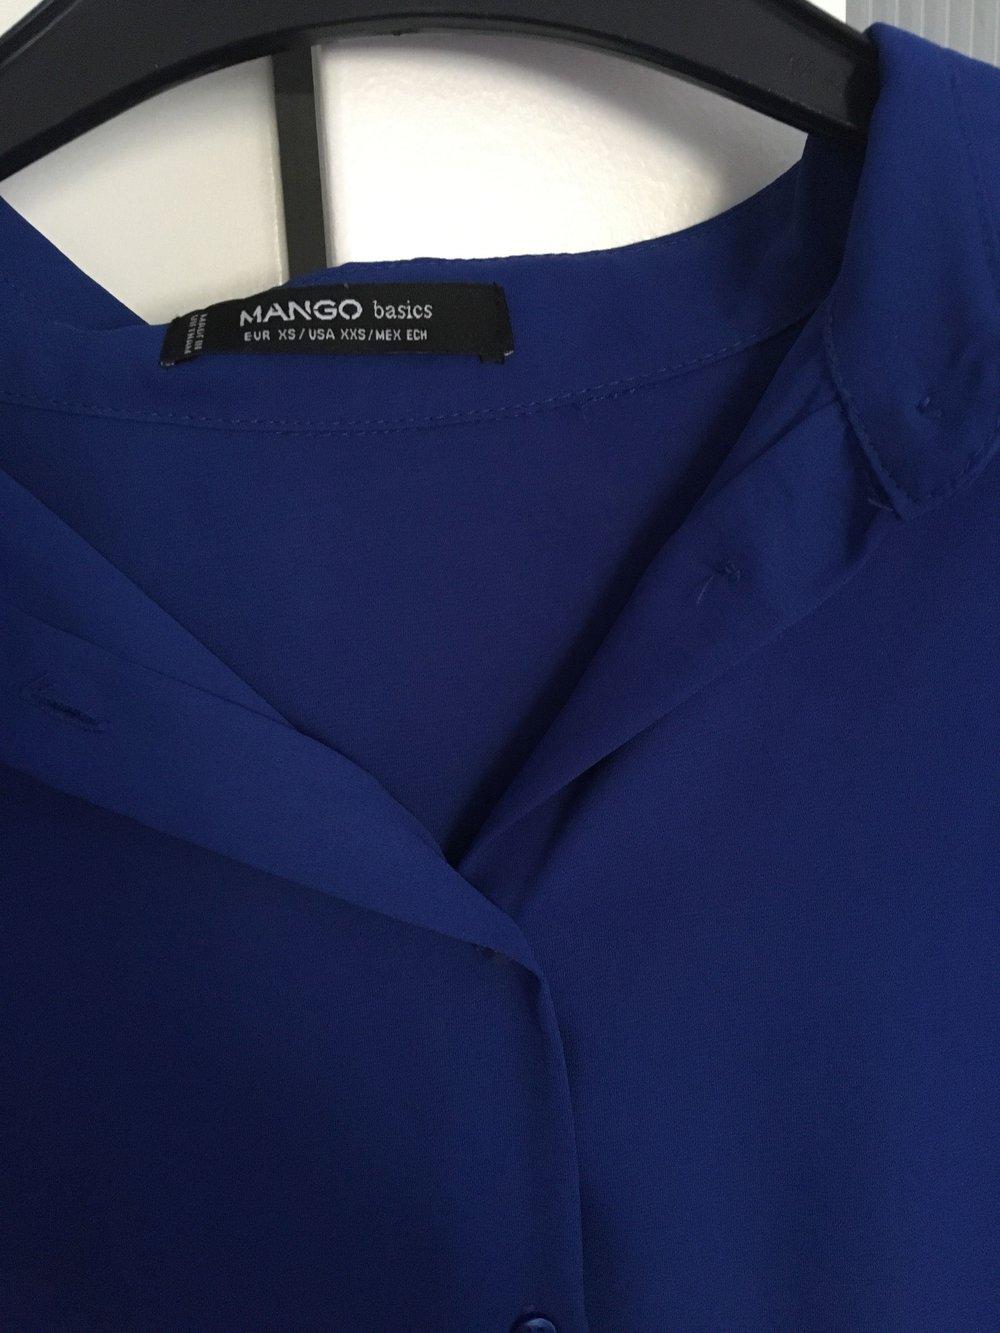 8d7995f08b29 Mango Collection - Mango Bluse Königsblau    Kleiderkorb.de